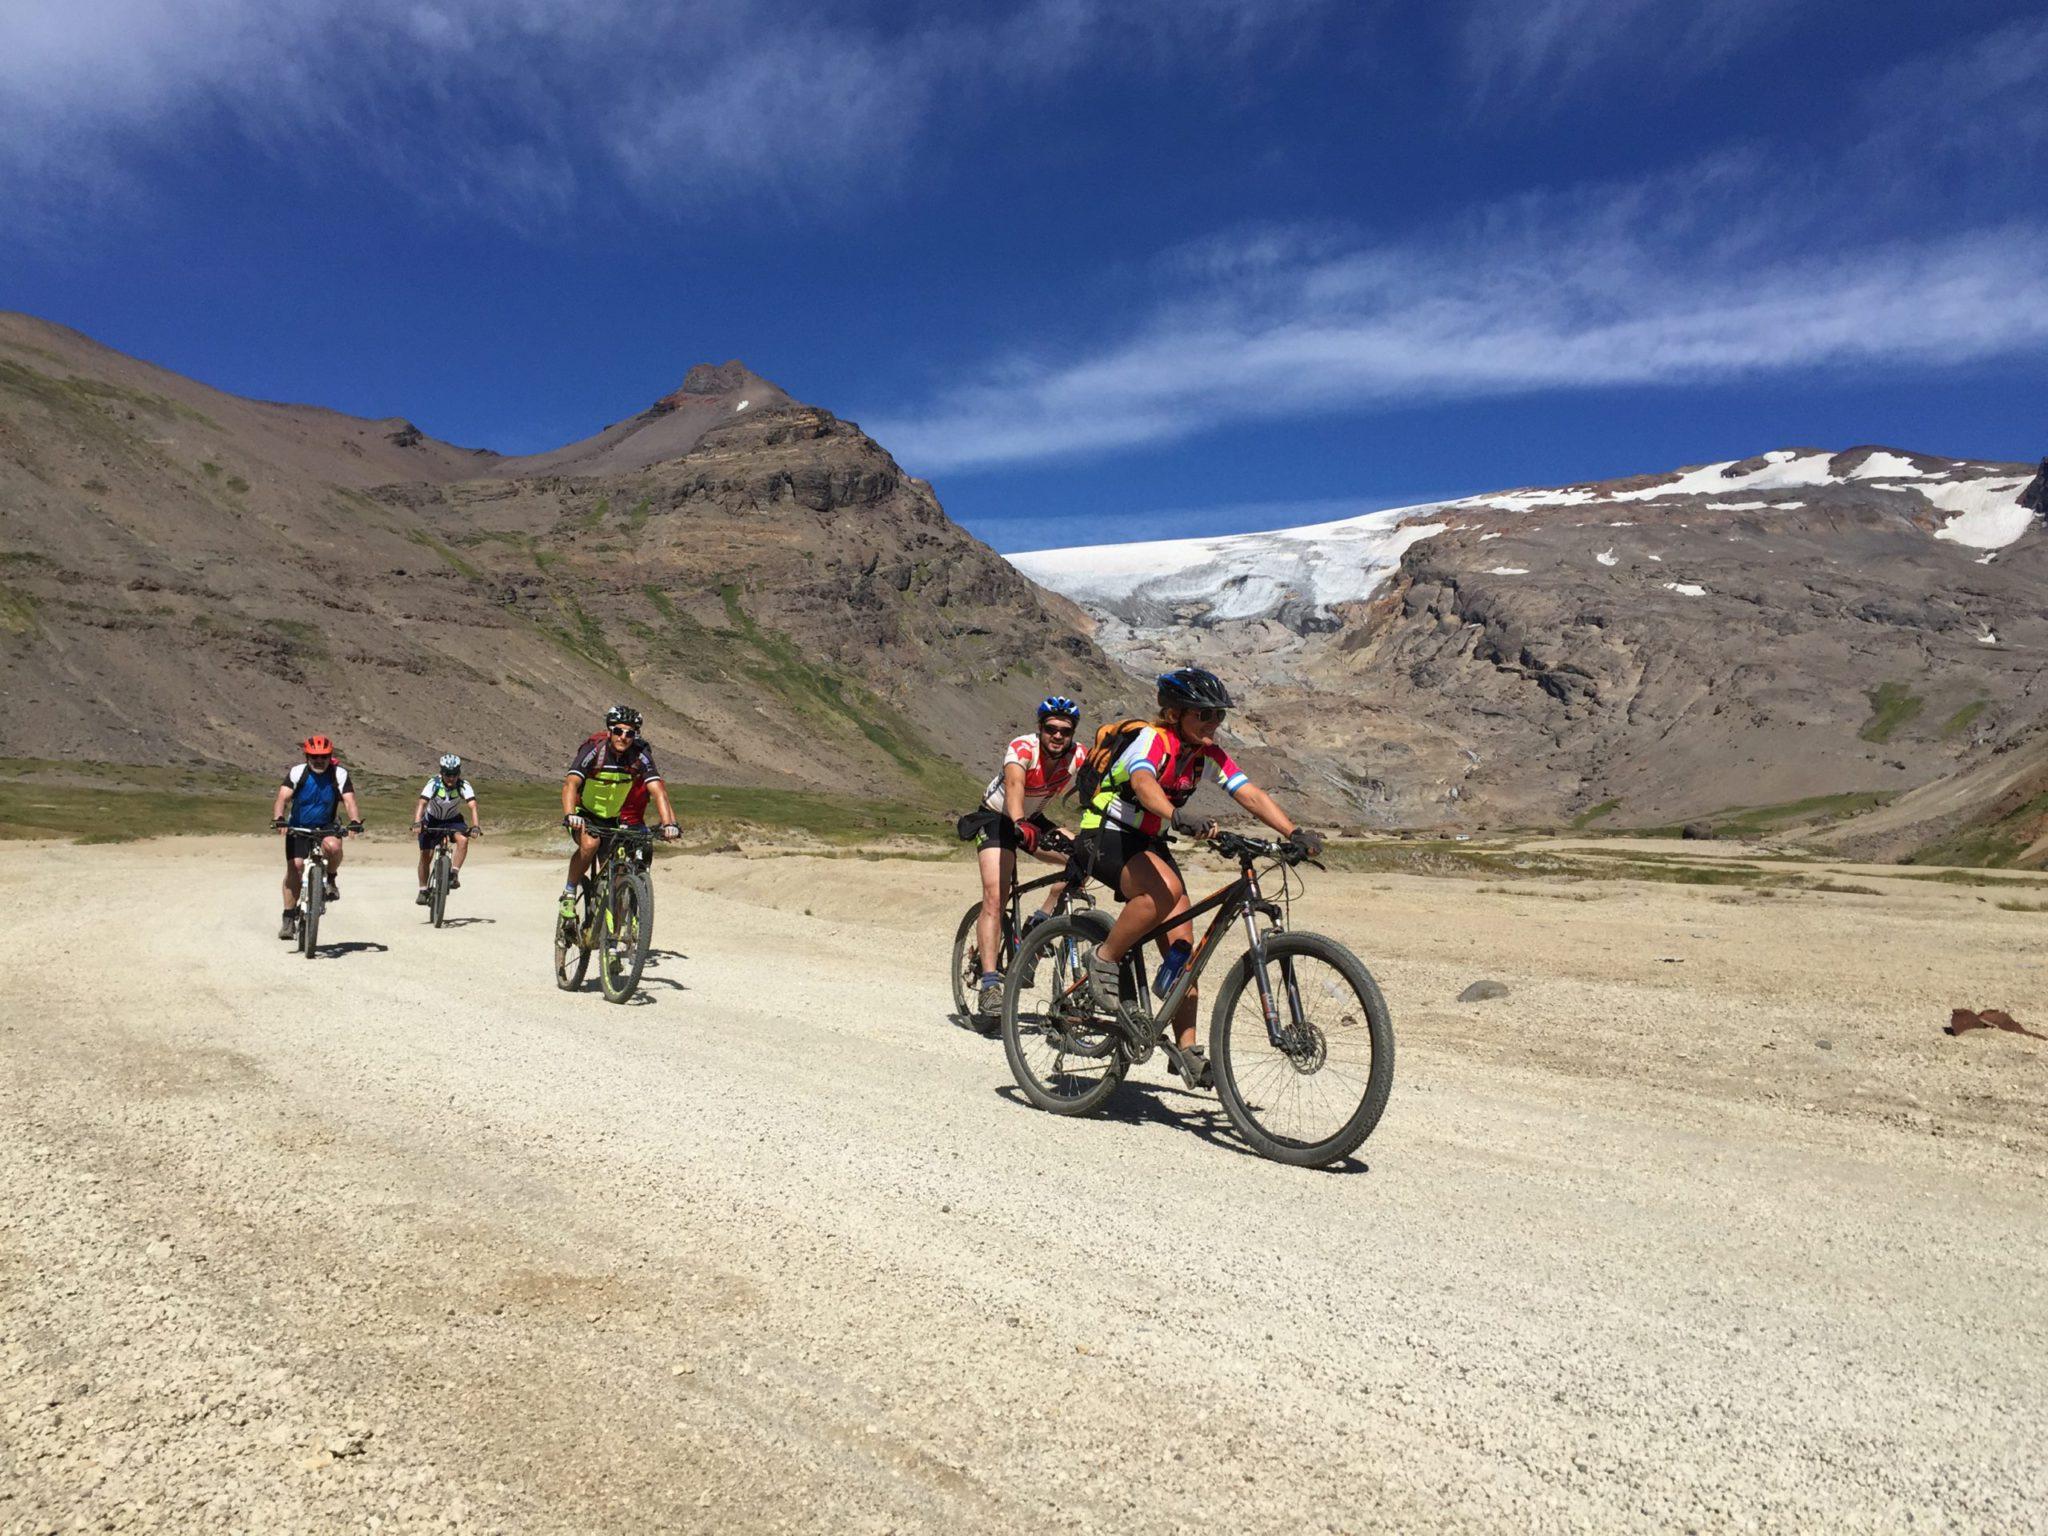 7 day cross Andes MTB trip through Vergara Pass, Argentina